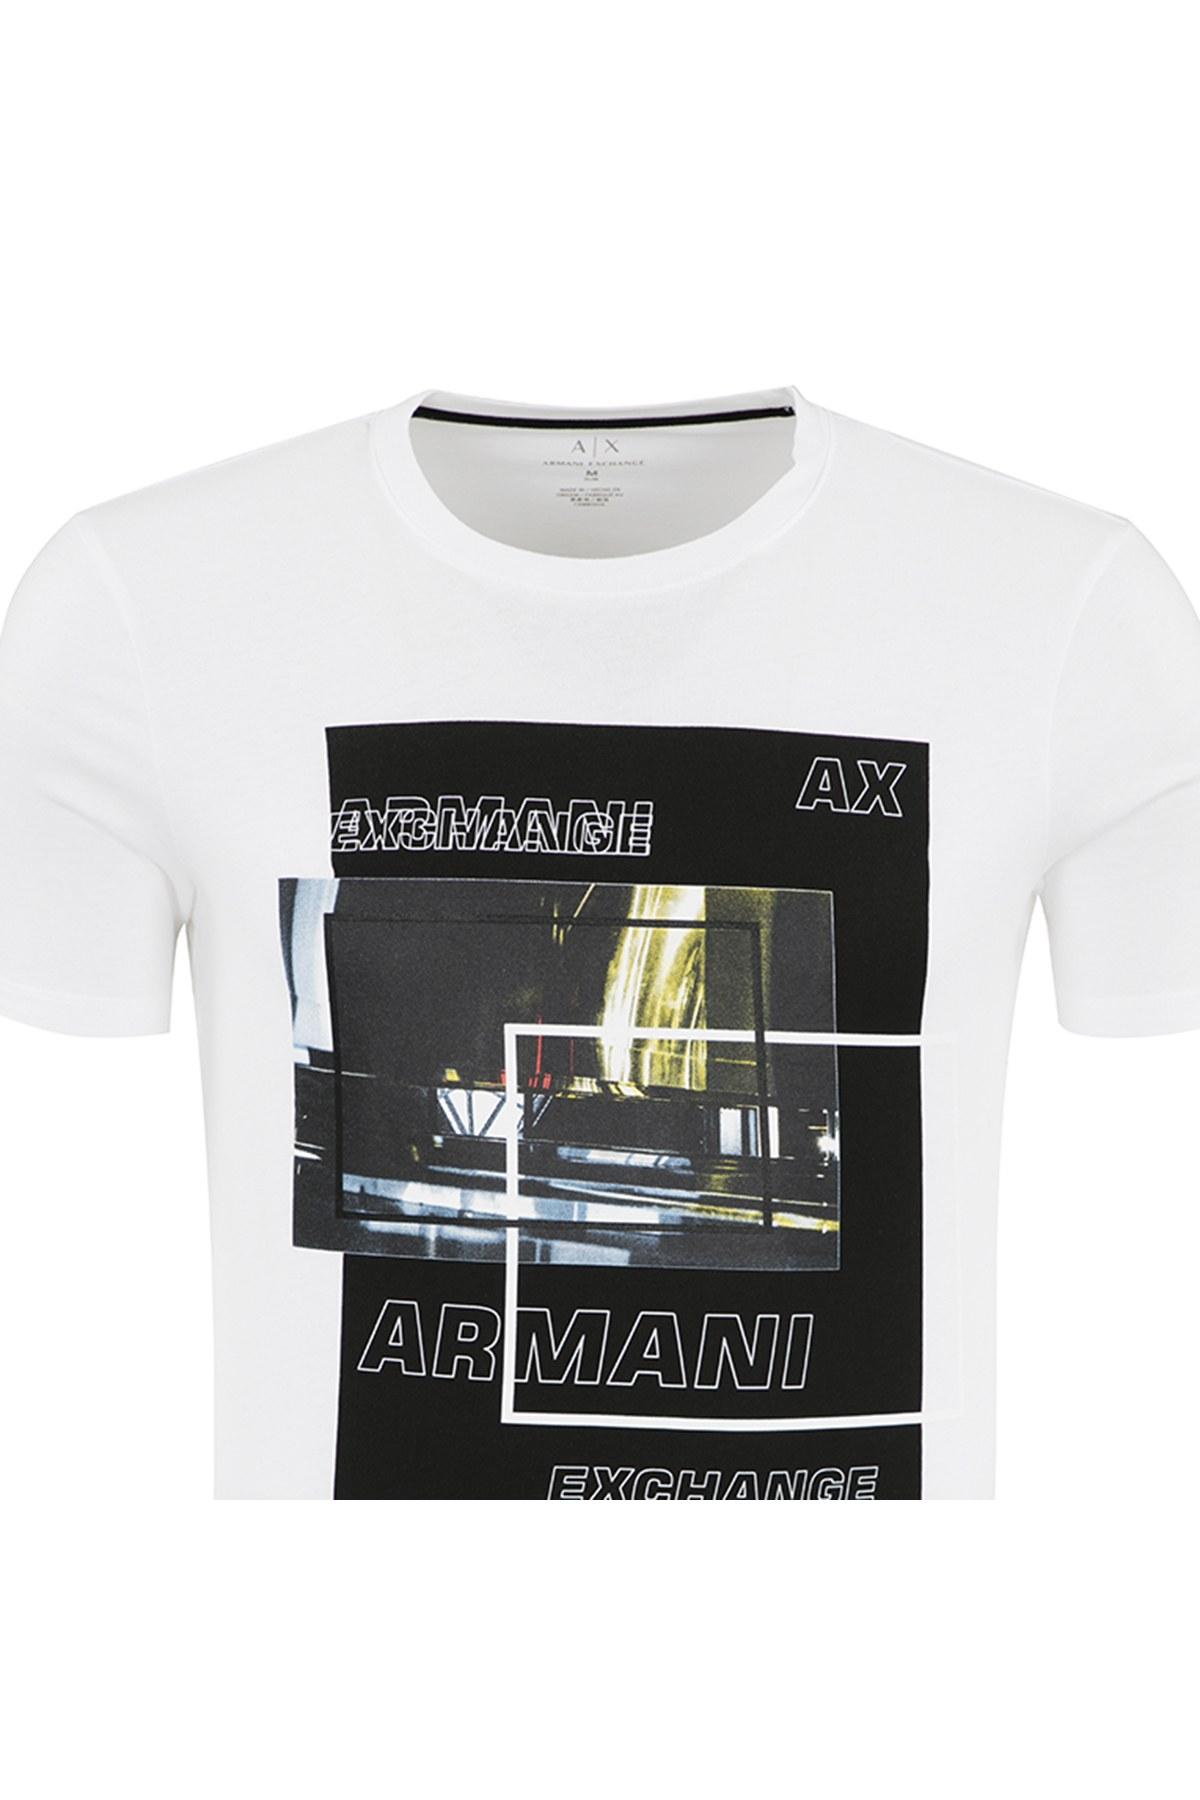 ARMANI EXCHANGE T SHIRT Erkek T Shirt 6ZZTBF ZJBUZ 1100 BEYAZ